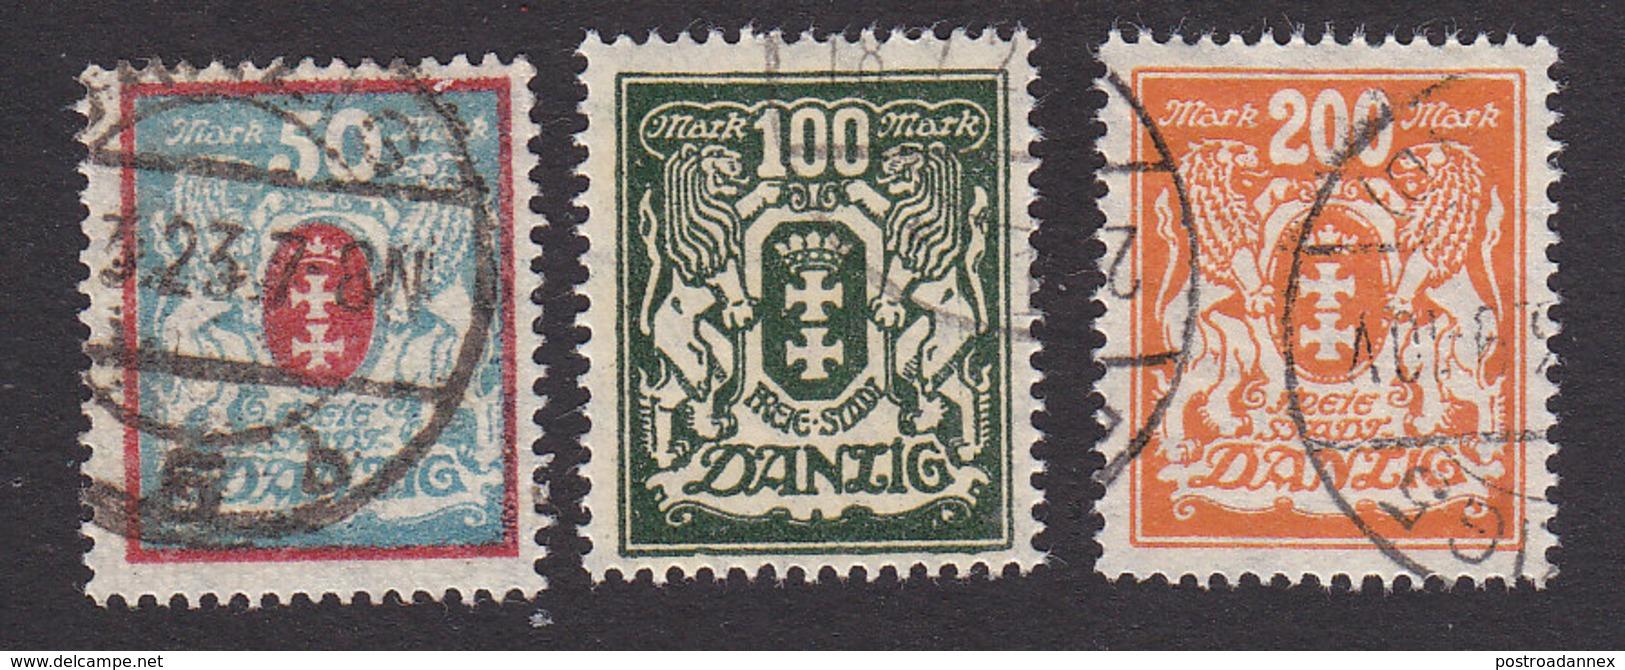 Danzig, Scott #106-107, 115, Used, Arms, Issued 1922 - Dantzig